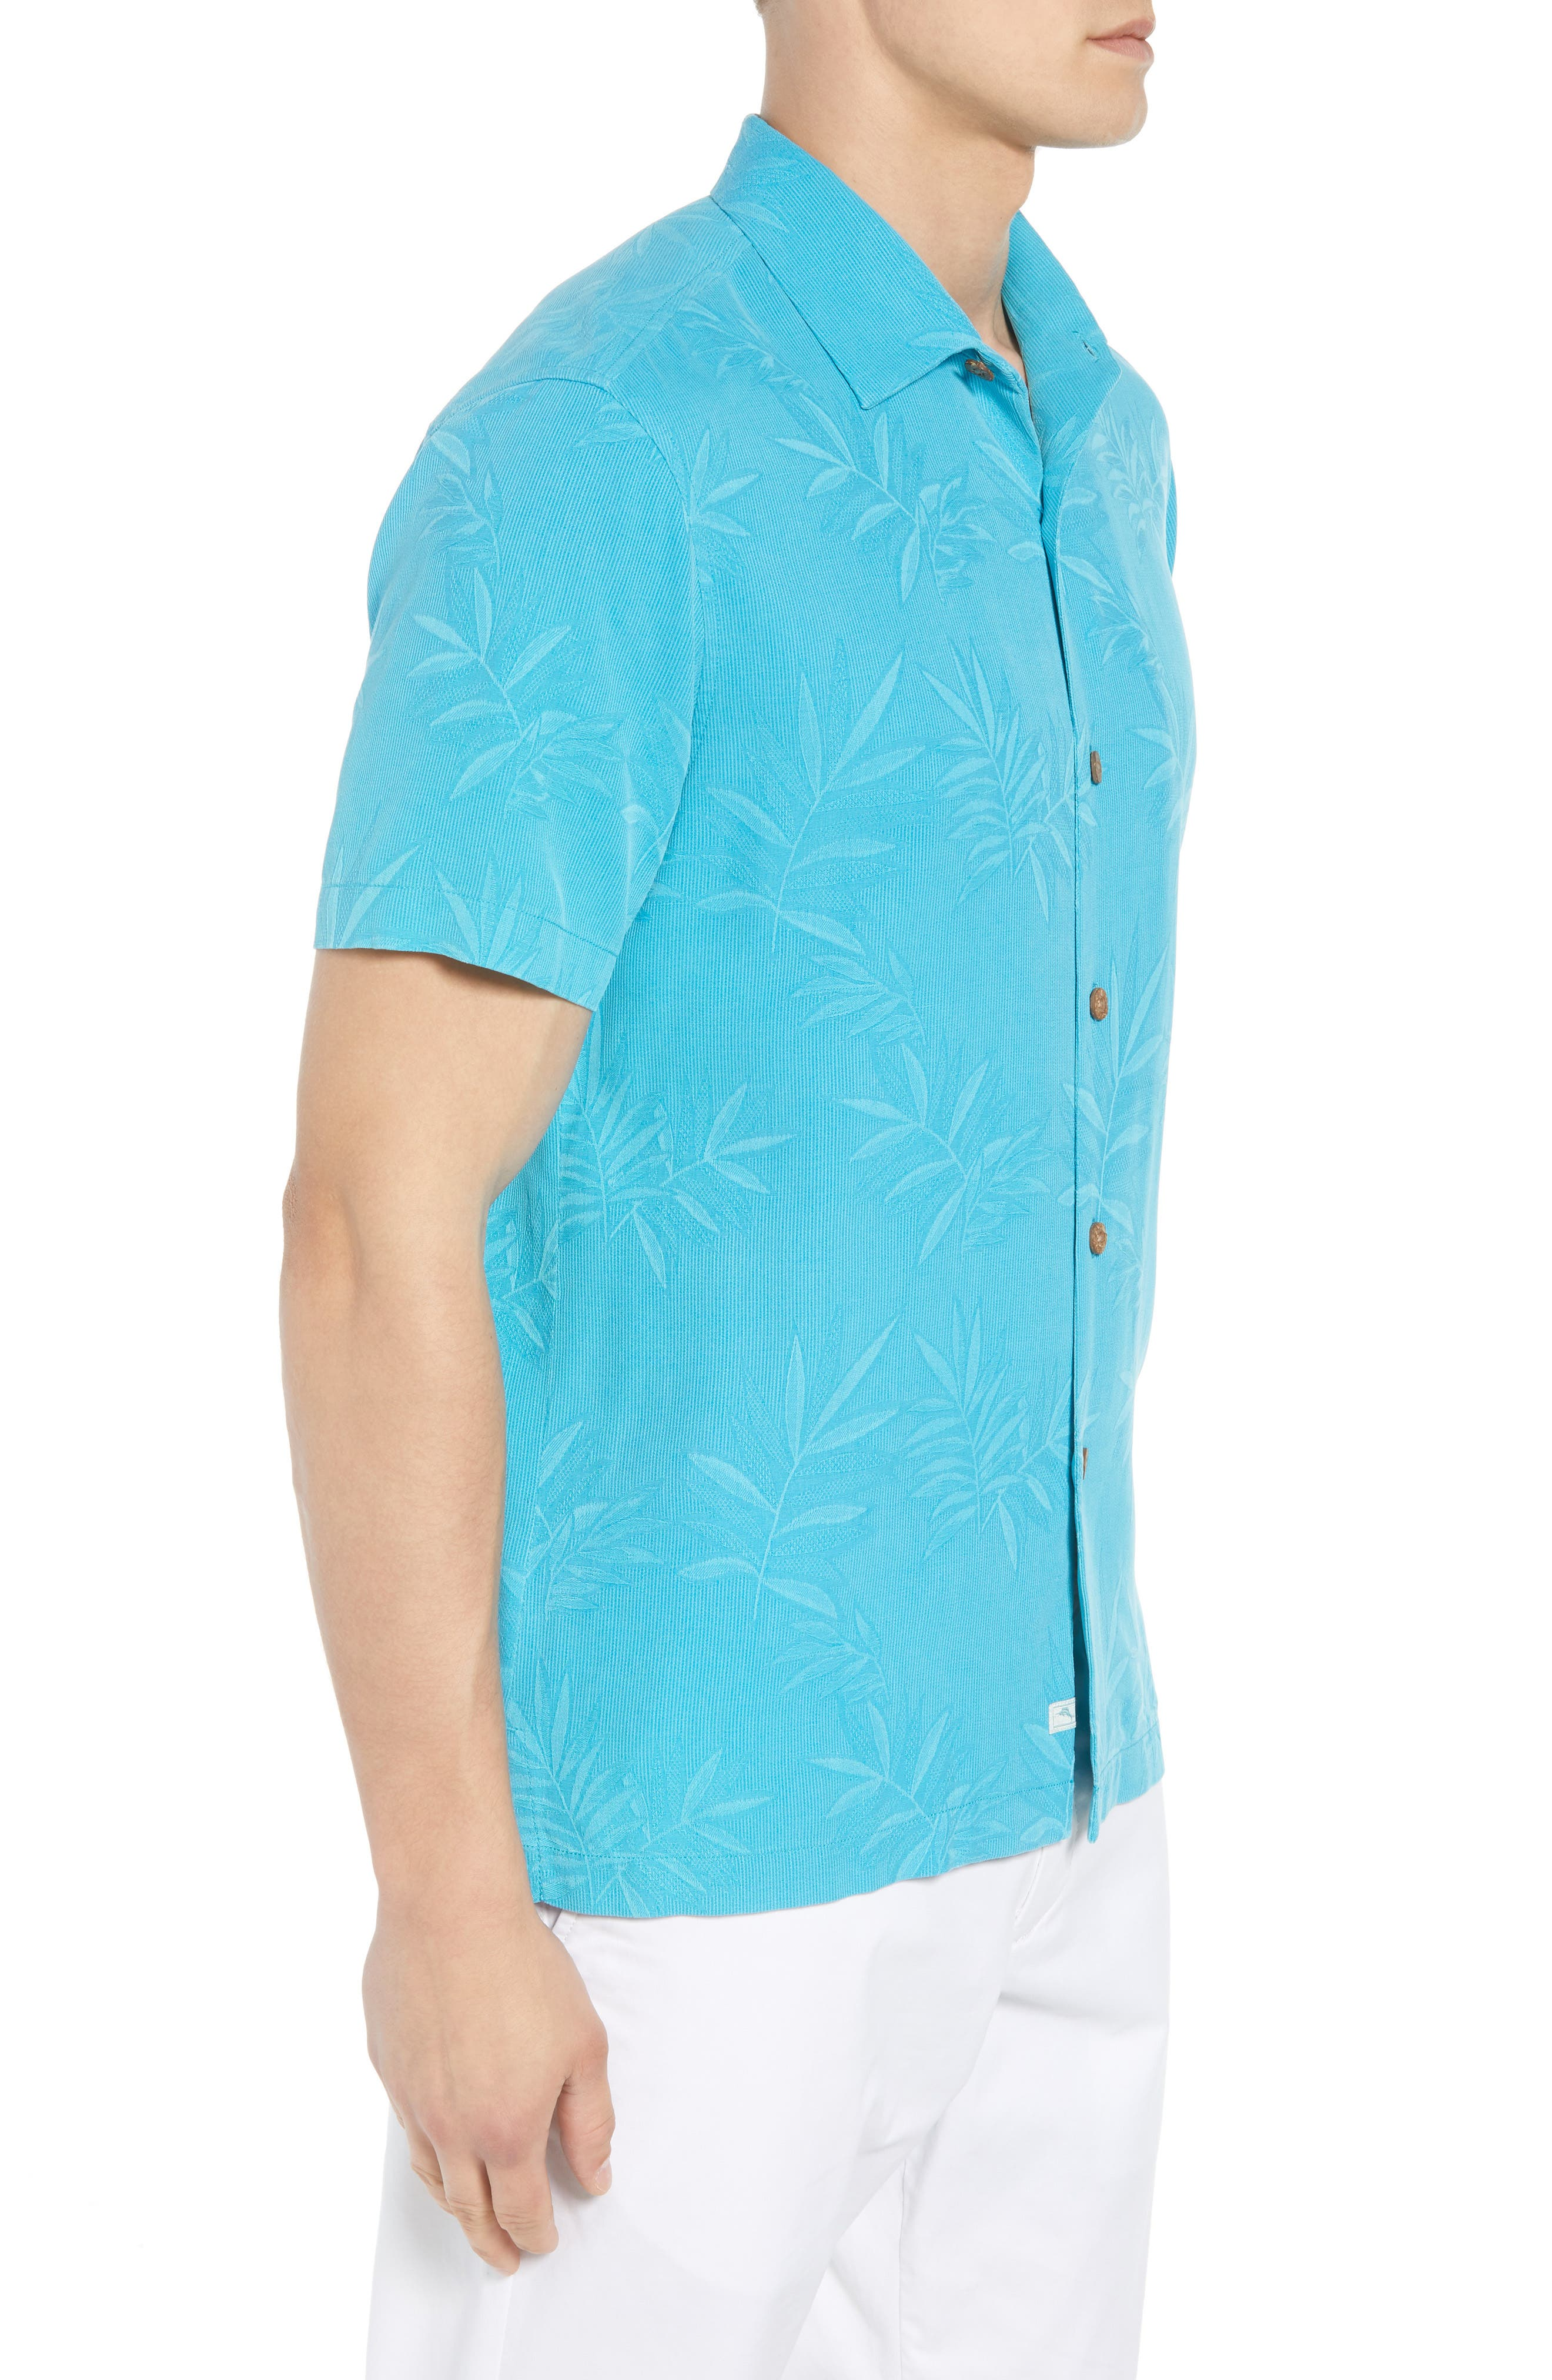 Luau Floral Silk Shirt,                             Alternate thumbnail 4, color,                             Pool Party Blue